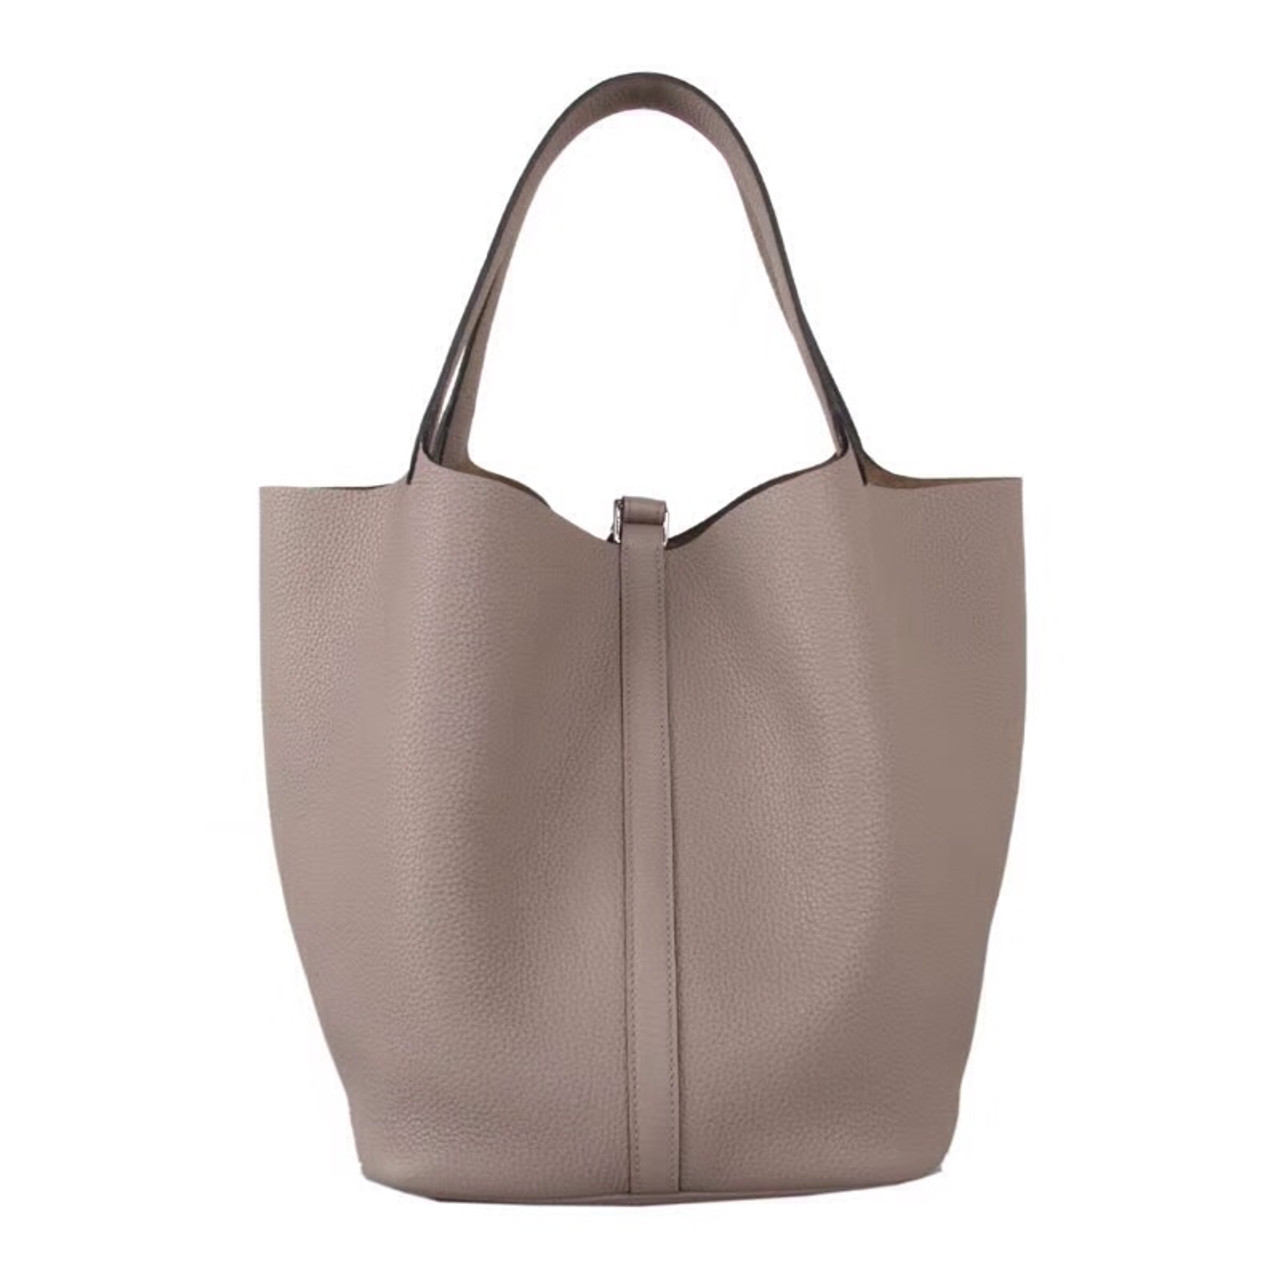 4fbfe706a4c9 Hermes M8 Gris Asphalte Picotin Lock GM Togo Leather Bag